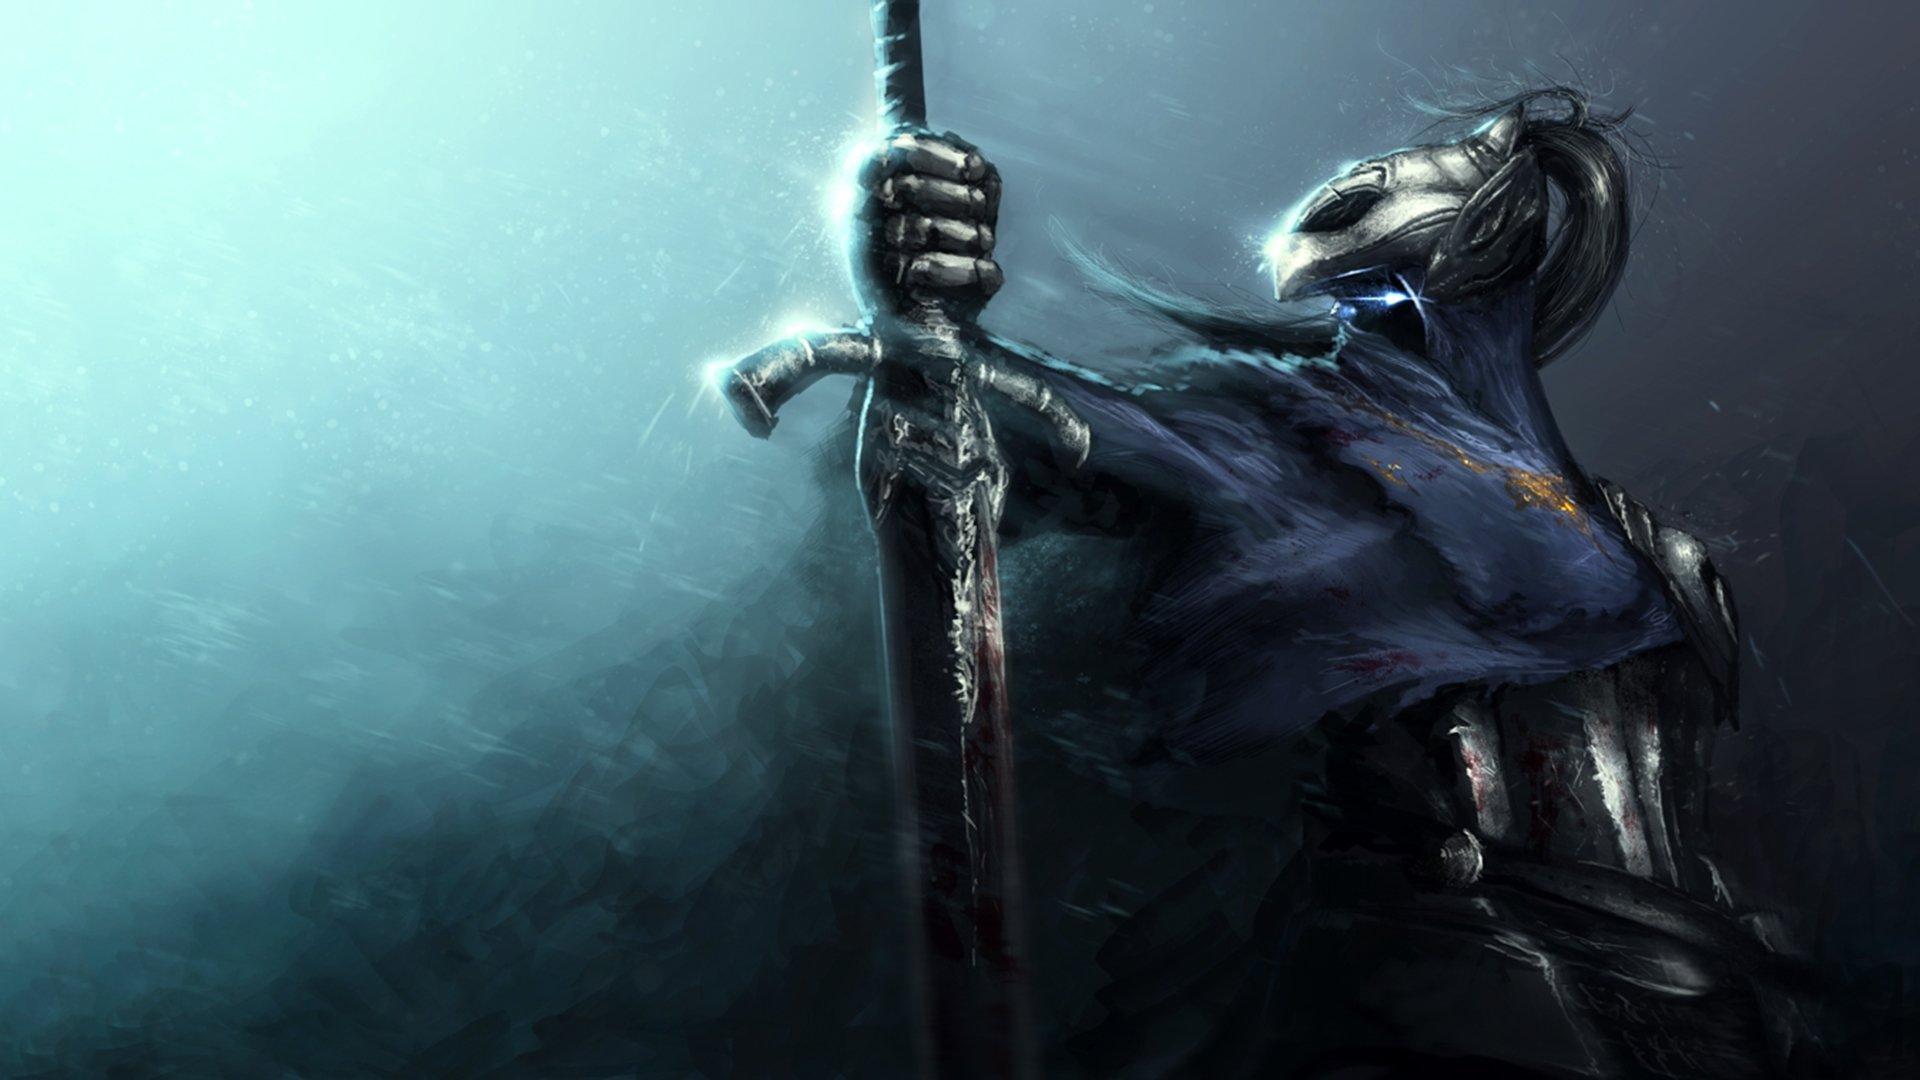 Best Artorias Dark Souls Background Id86760 For High